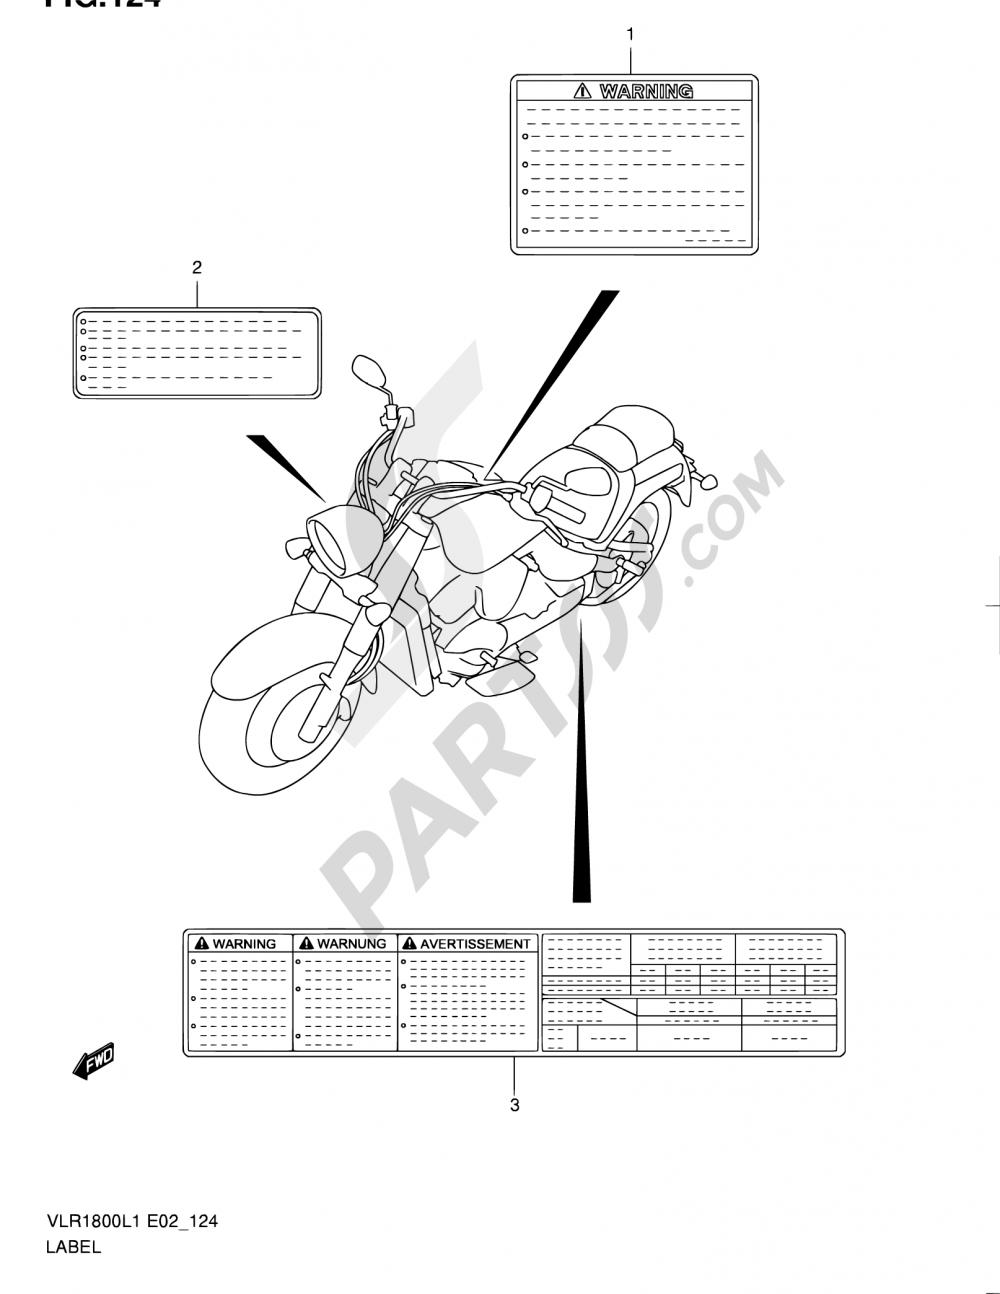 124 - LABEL (VLR1800UFL1 E19) Suzuki INTRUDER VLR1800T 2011